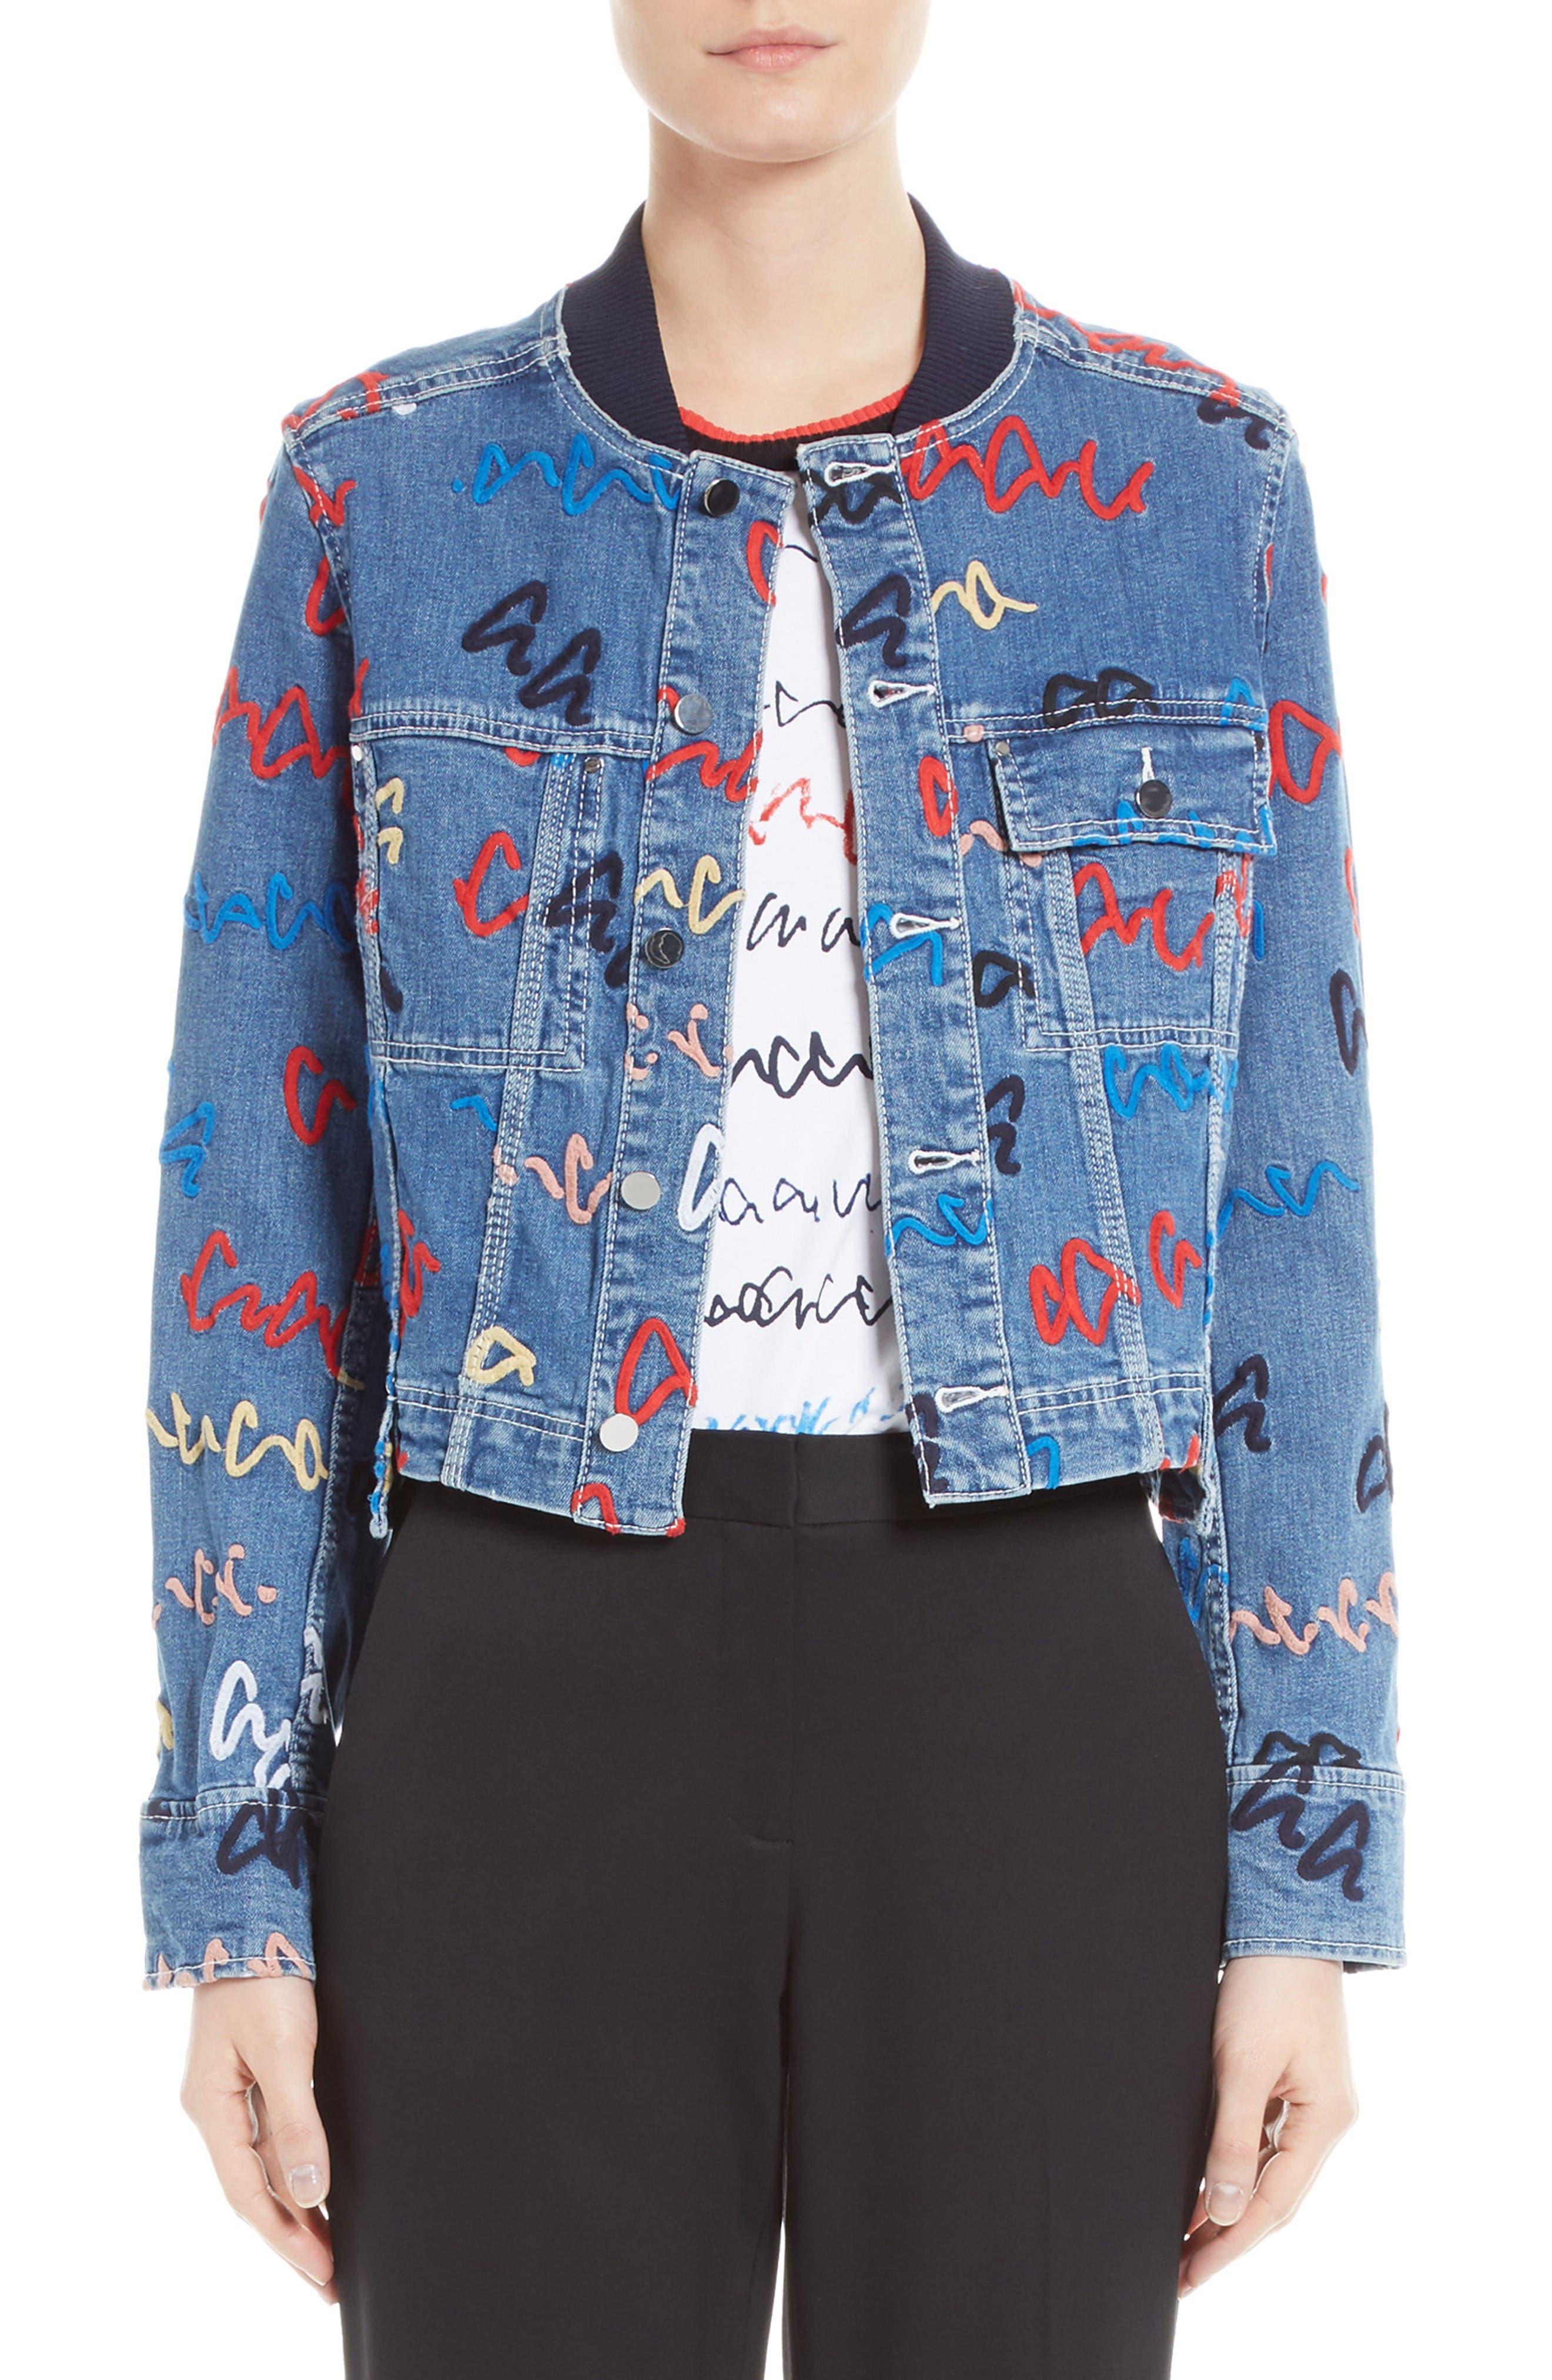 Alternate Image 1 Selected - GREY Jason Wu Scribble Embroidered Denim Jacket